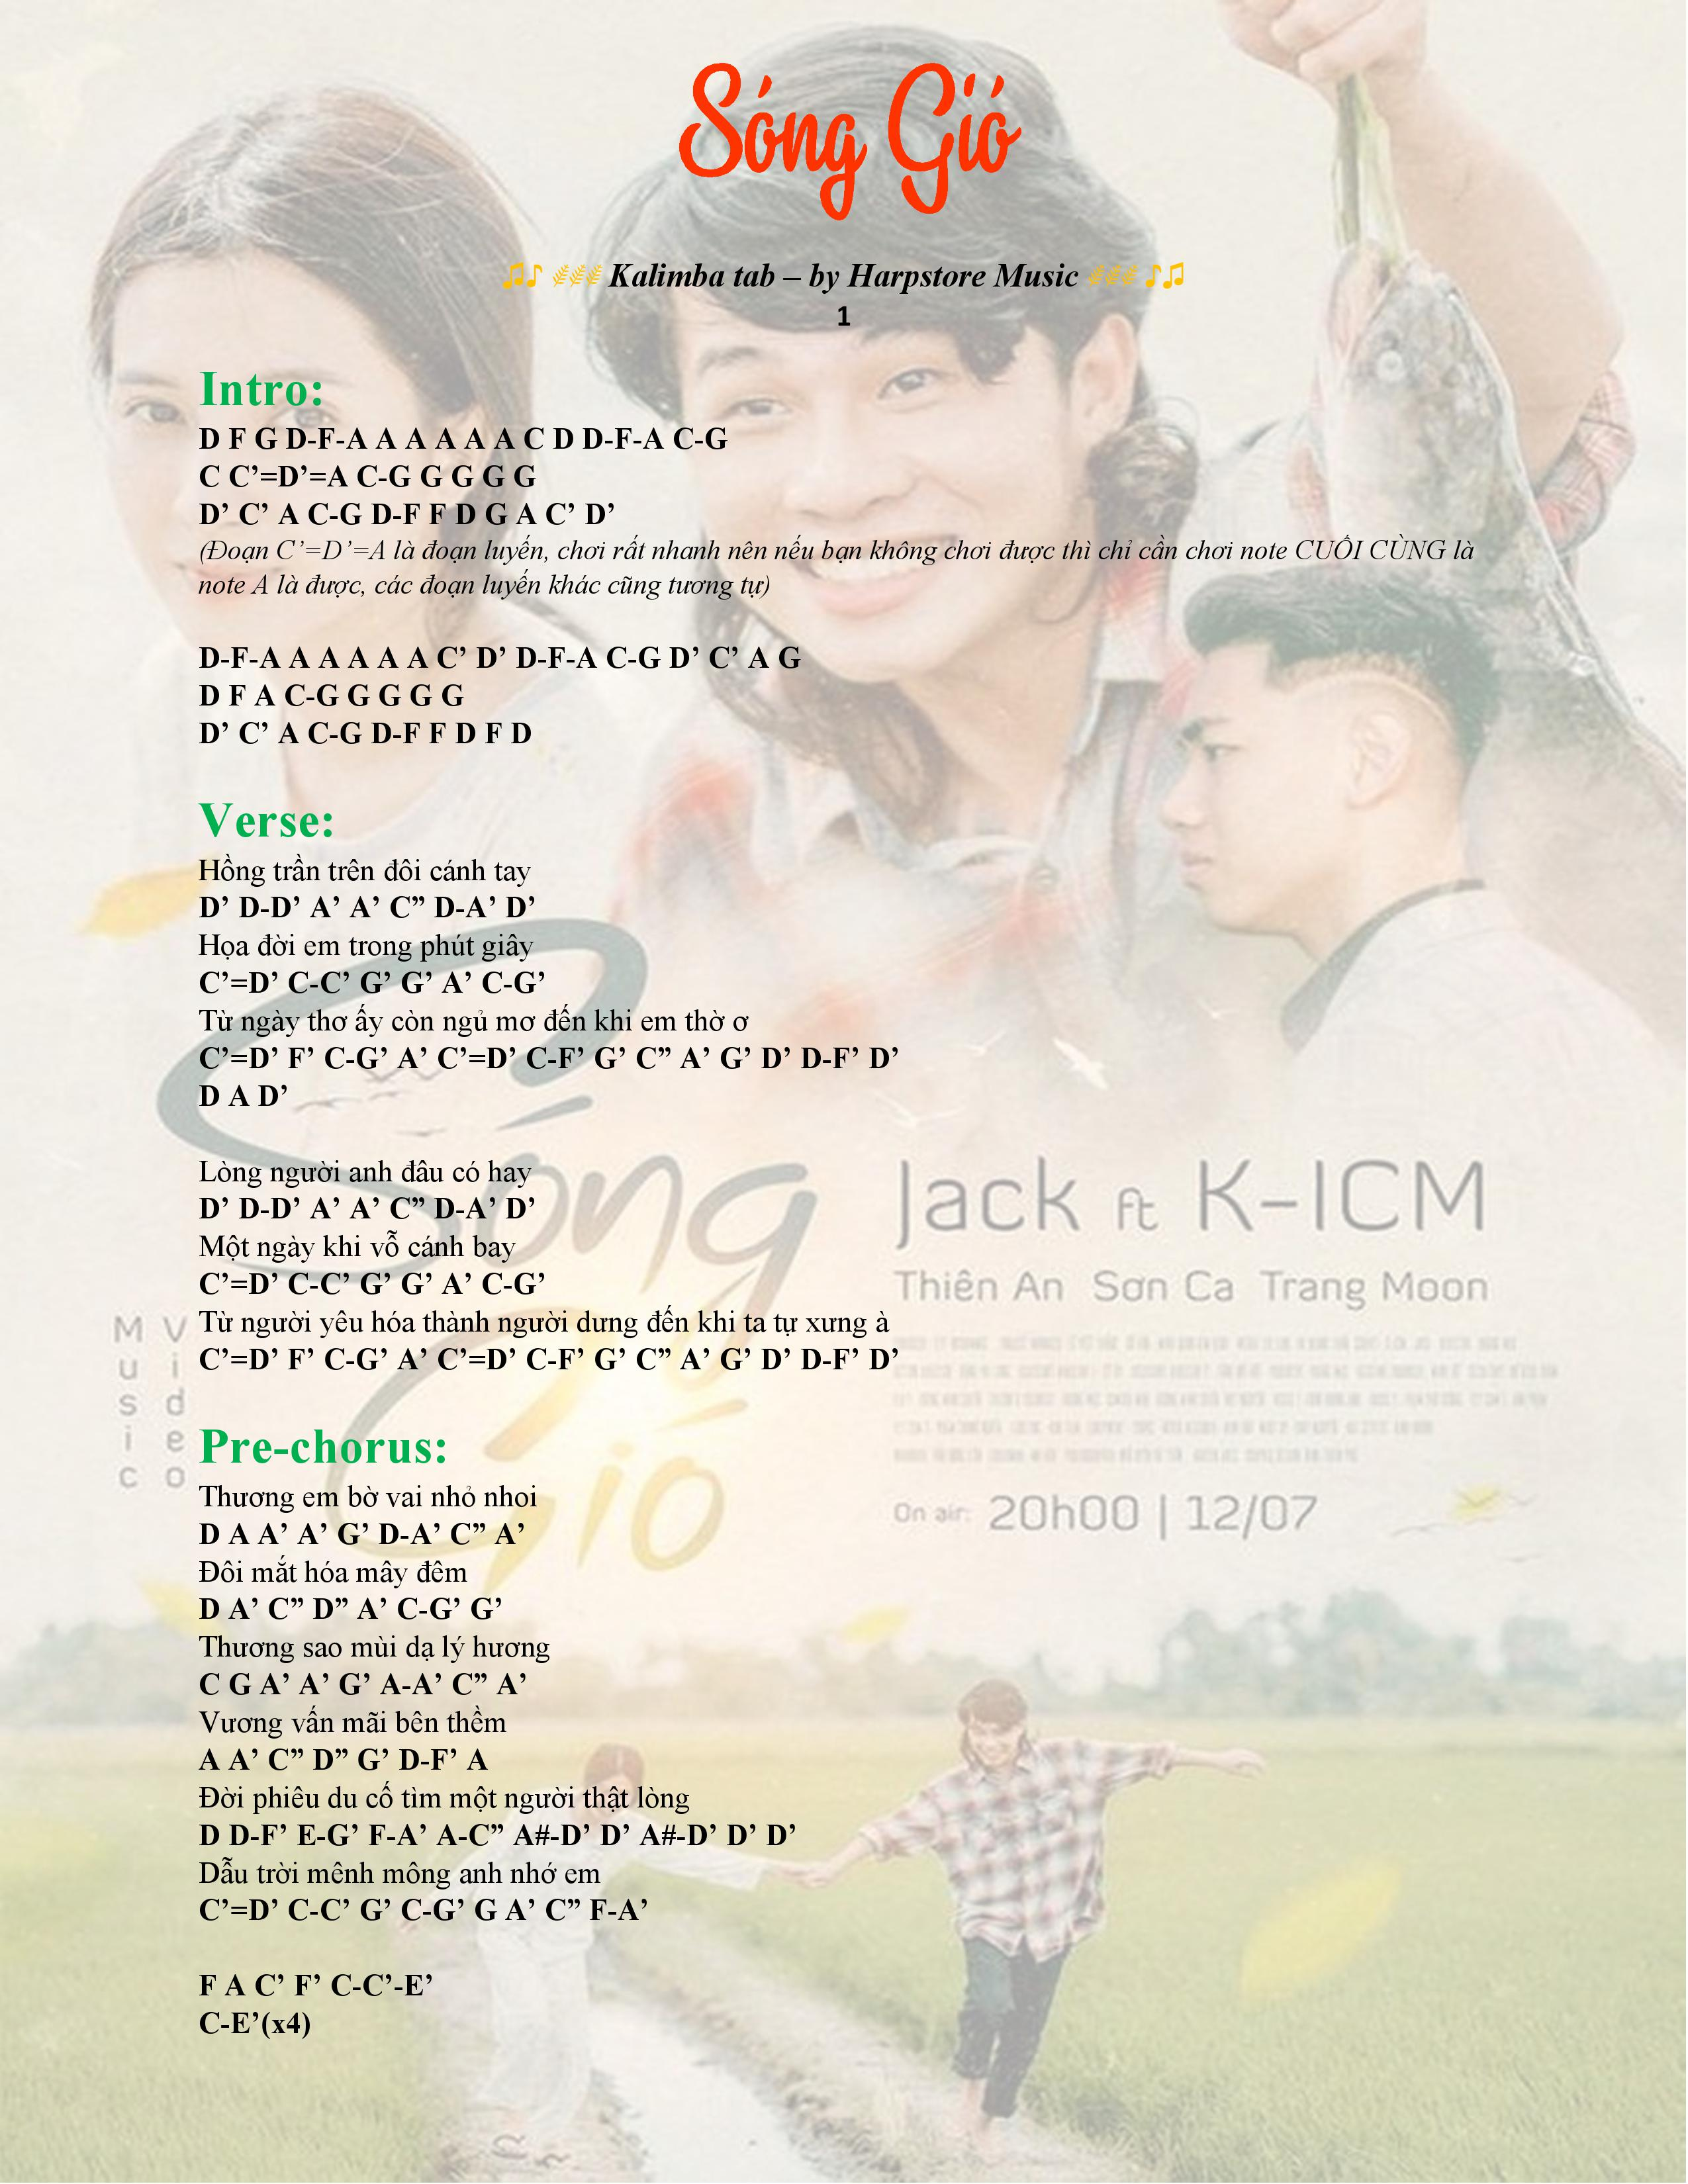 Kalimb tab song gio kicm jack 01